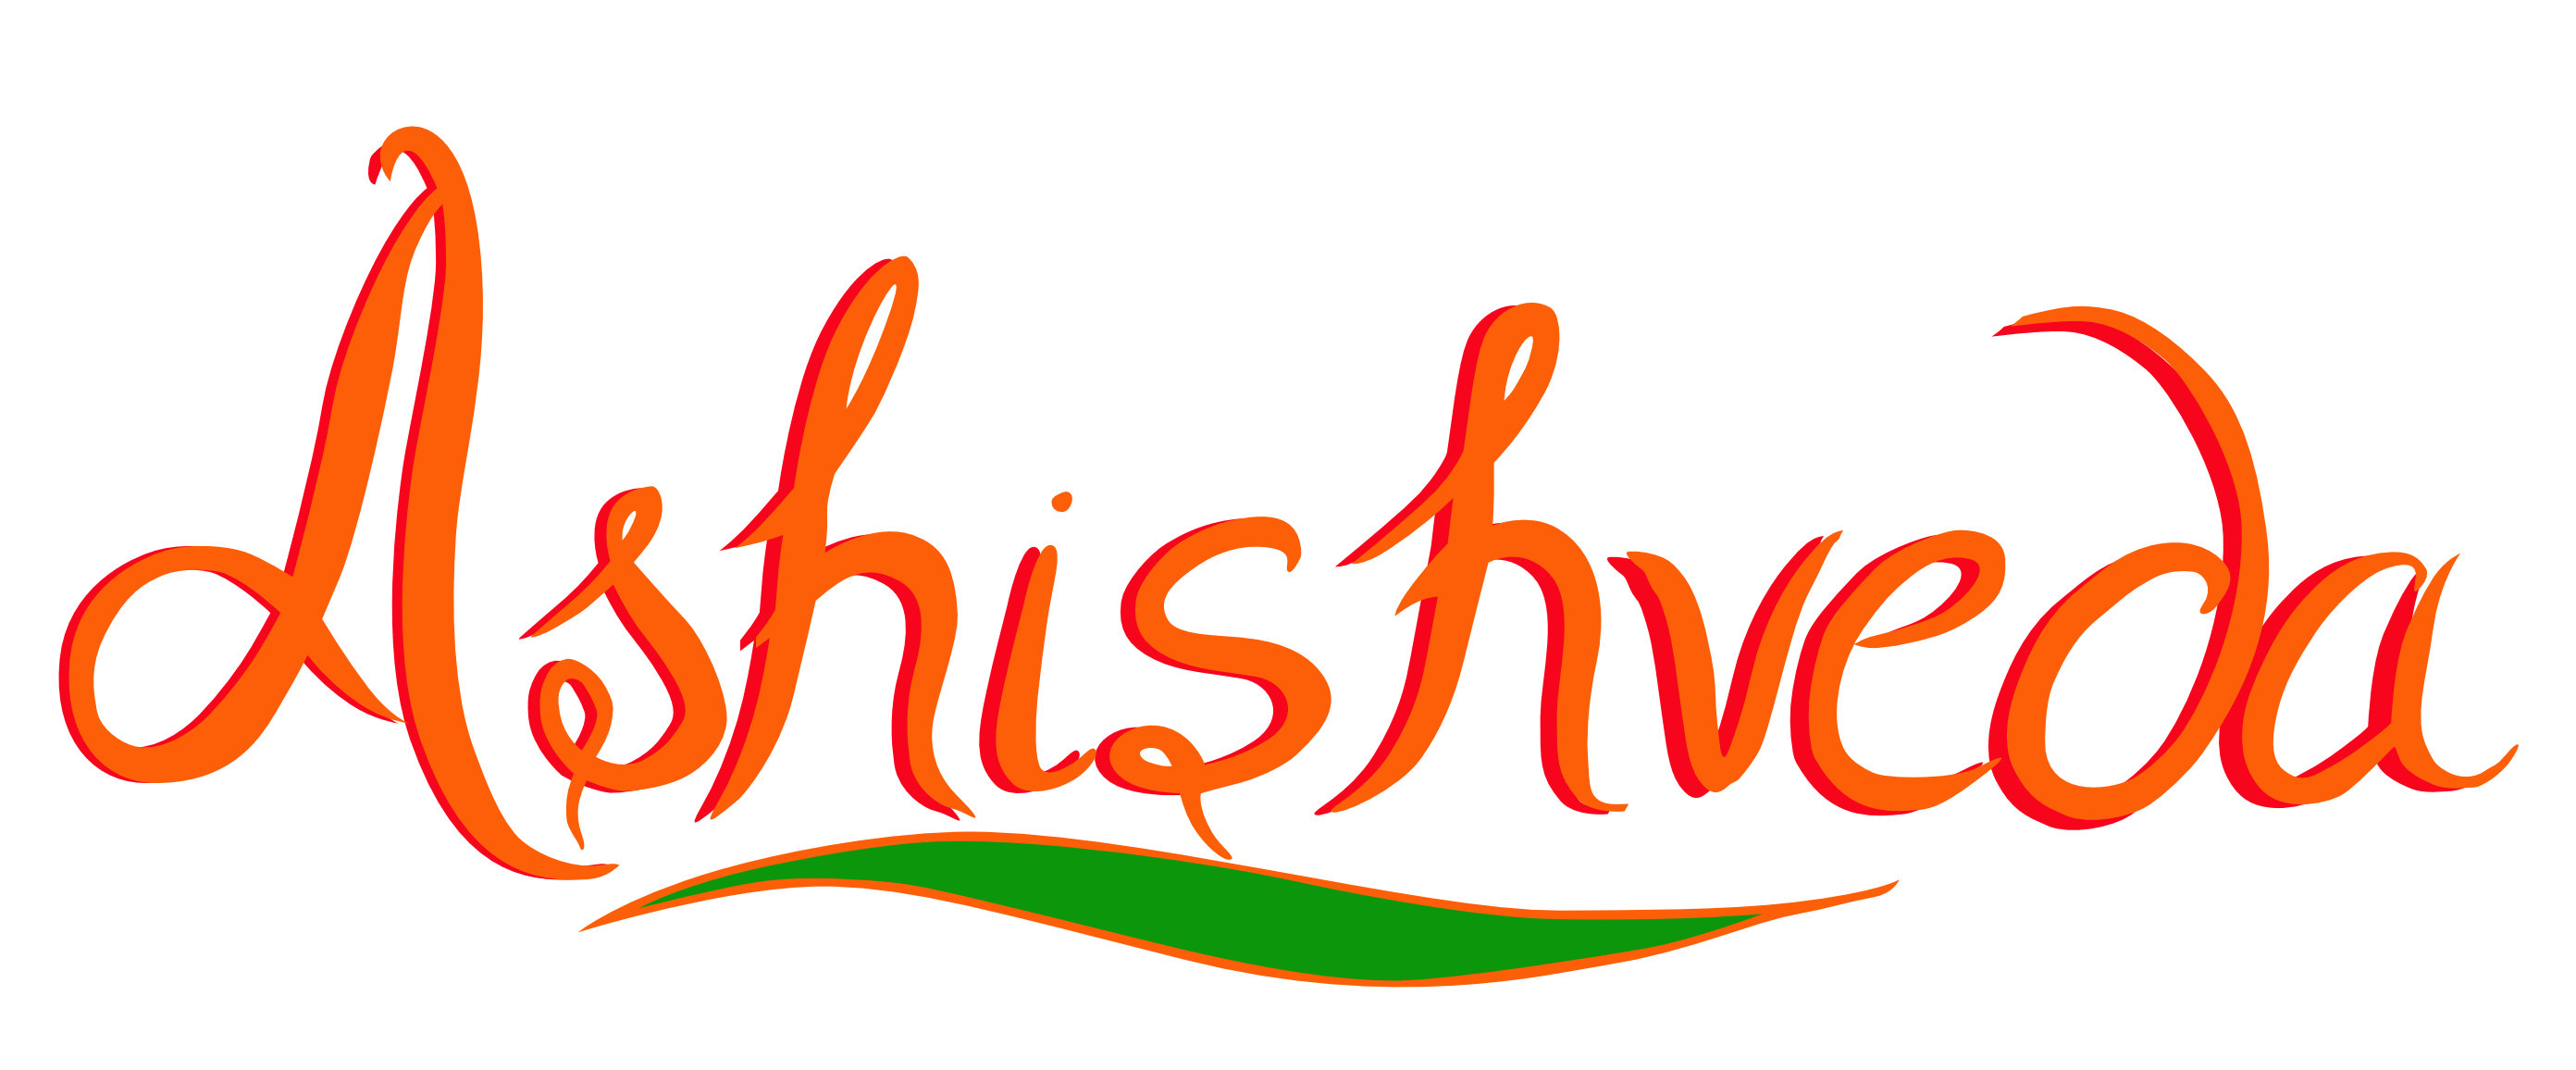 Ashishveda